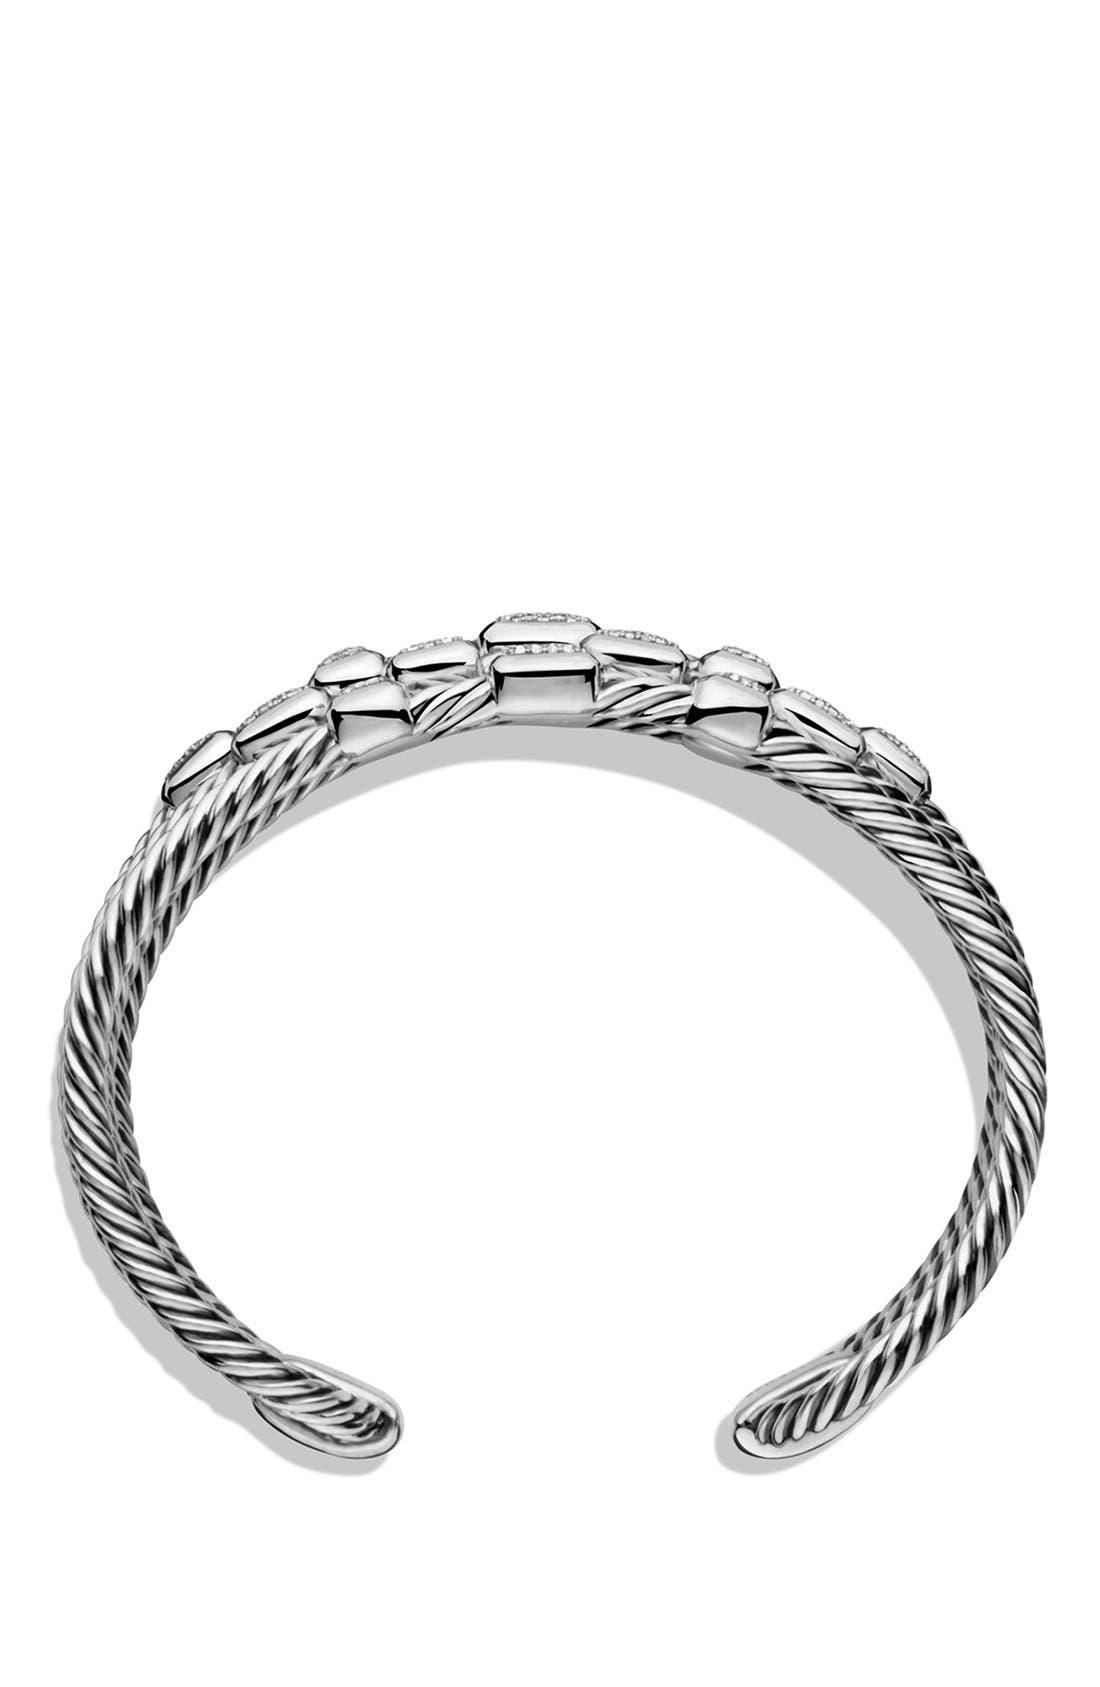 Alternate Image 2  - David Yurman 'Confetti' Wide Cuff Bracelet with Diamonds